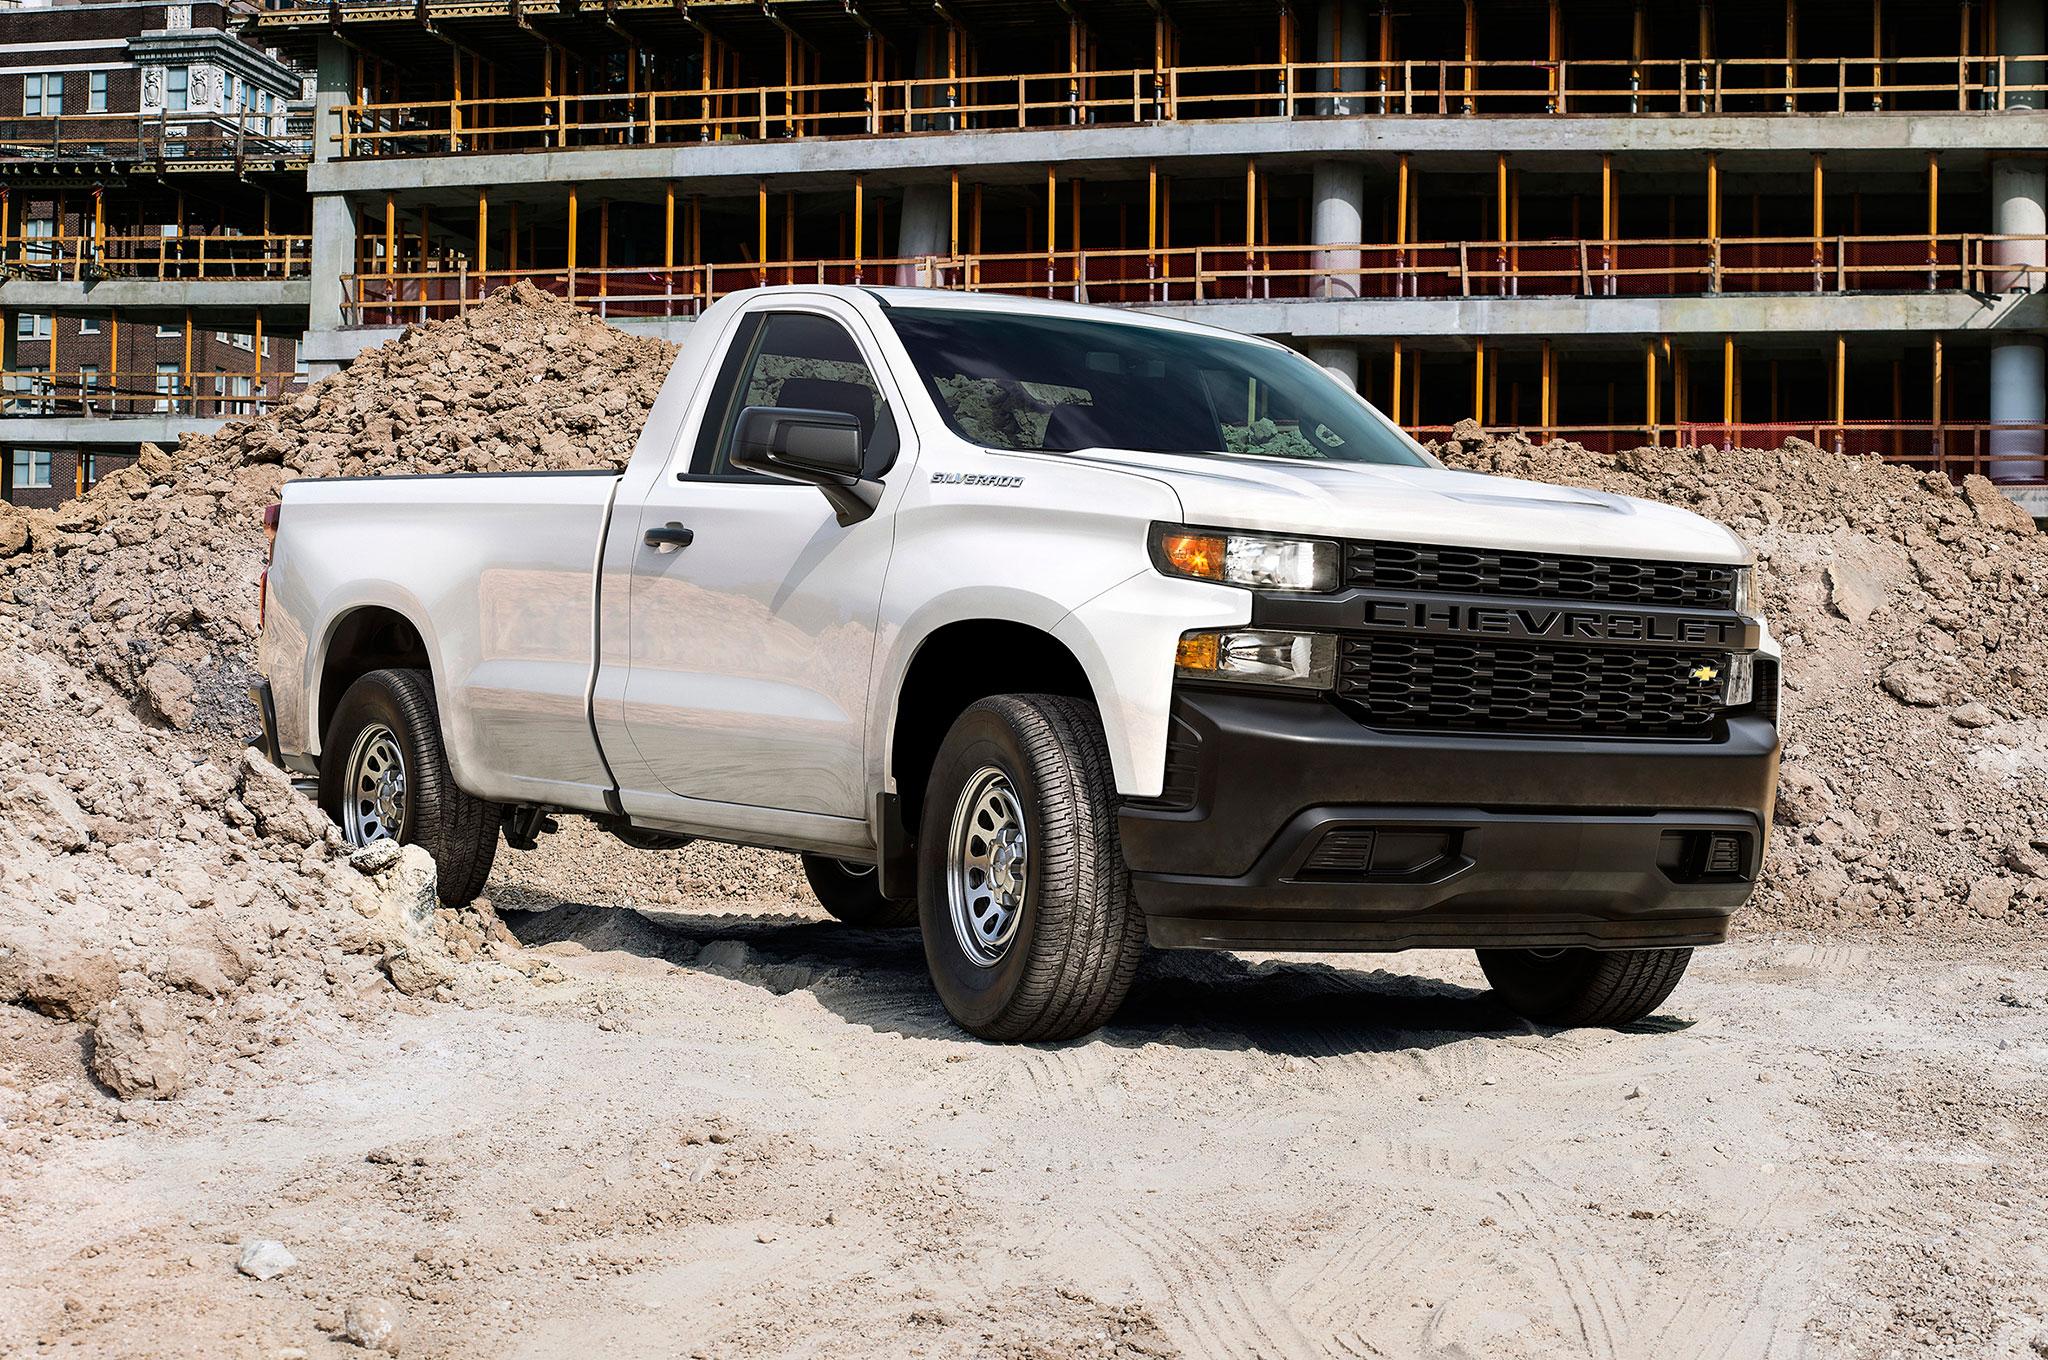 GM Picks Flint, Michigan to Make 2019 Chevrolet Silverado ...